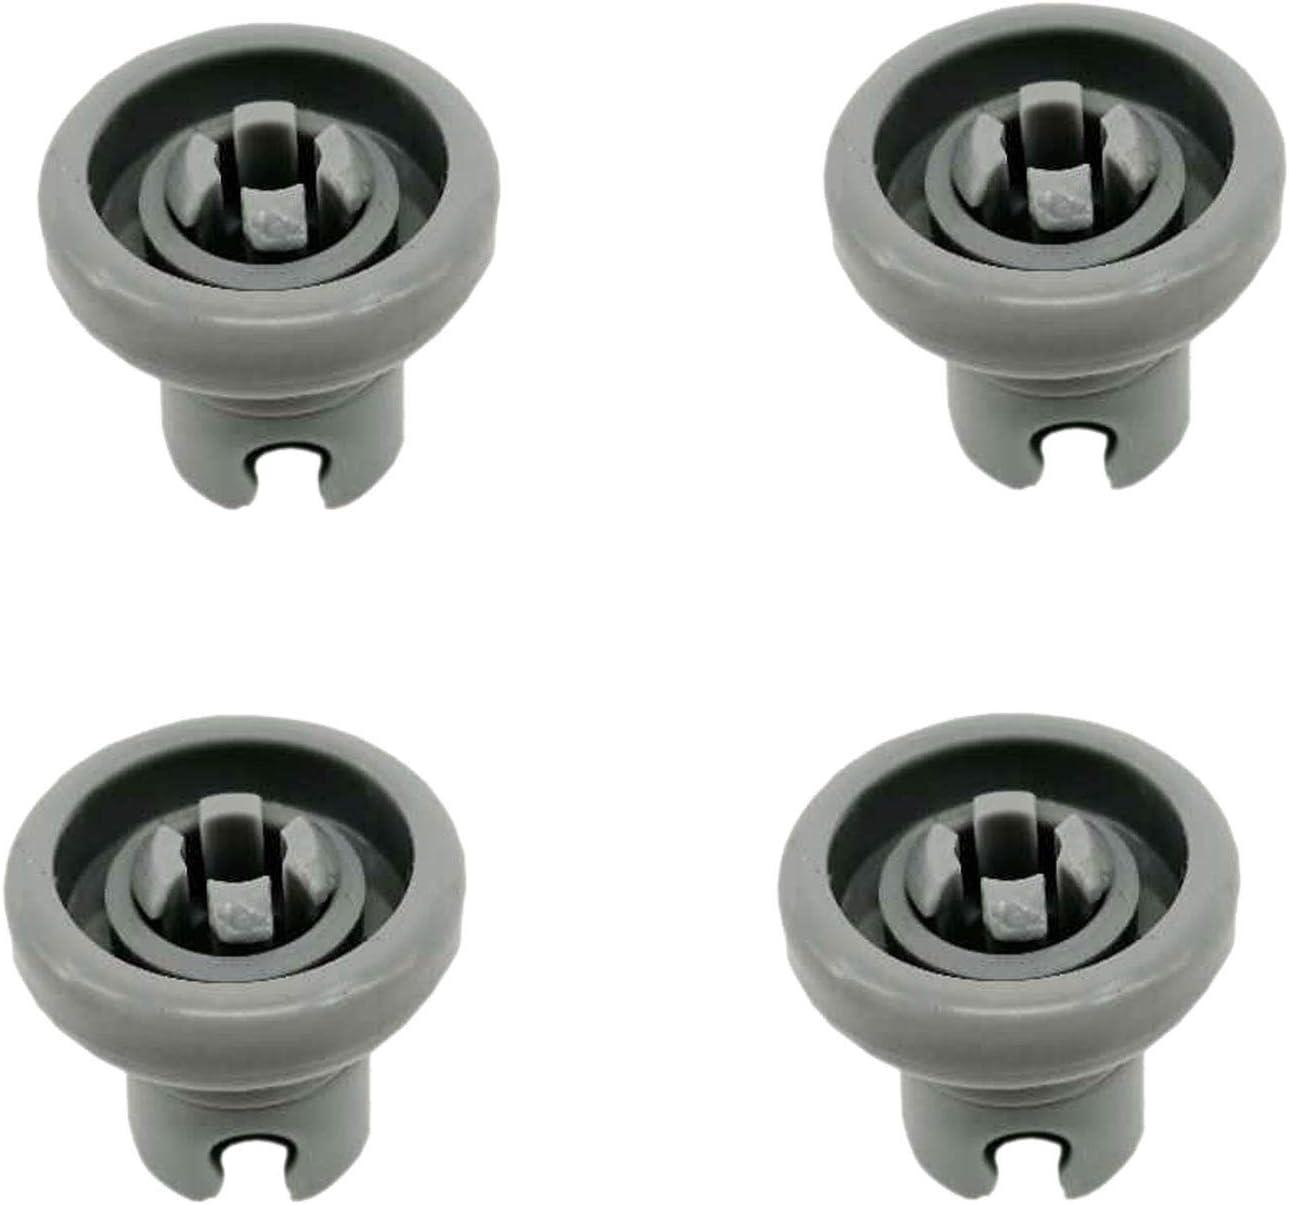 8X Dishwasher Upper Basket Wheel For Electrolux 50286967000 50286966002 25mm Top Bottom Roller Runner /& Clip Axle